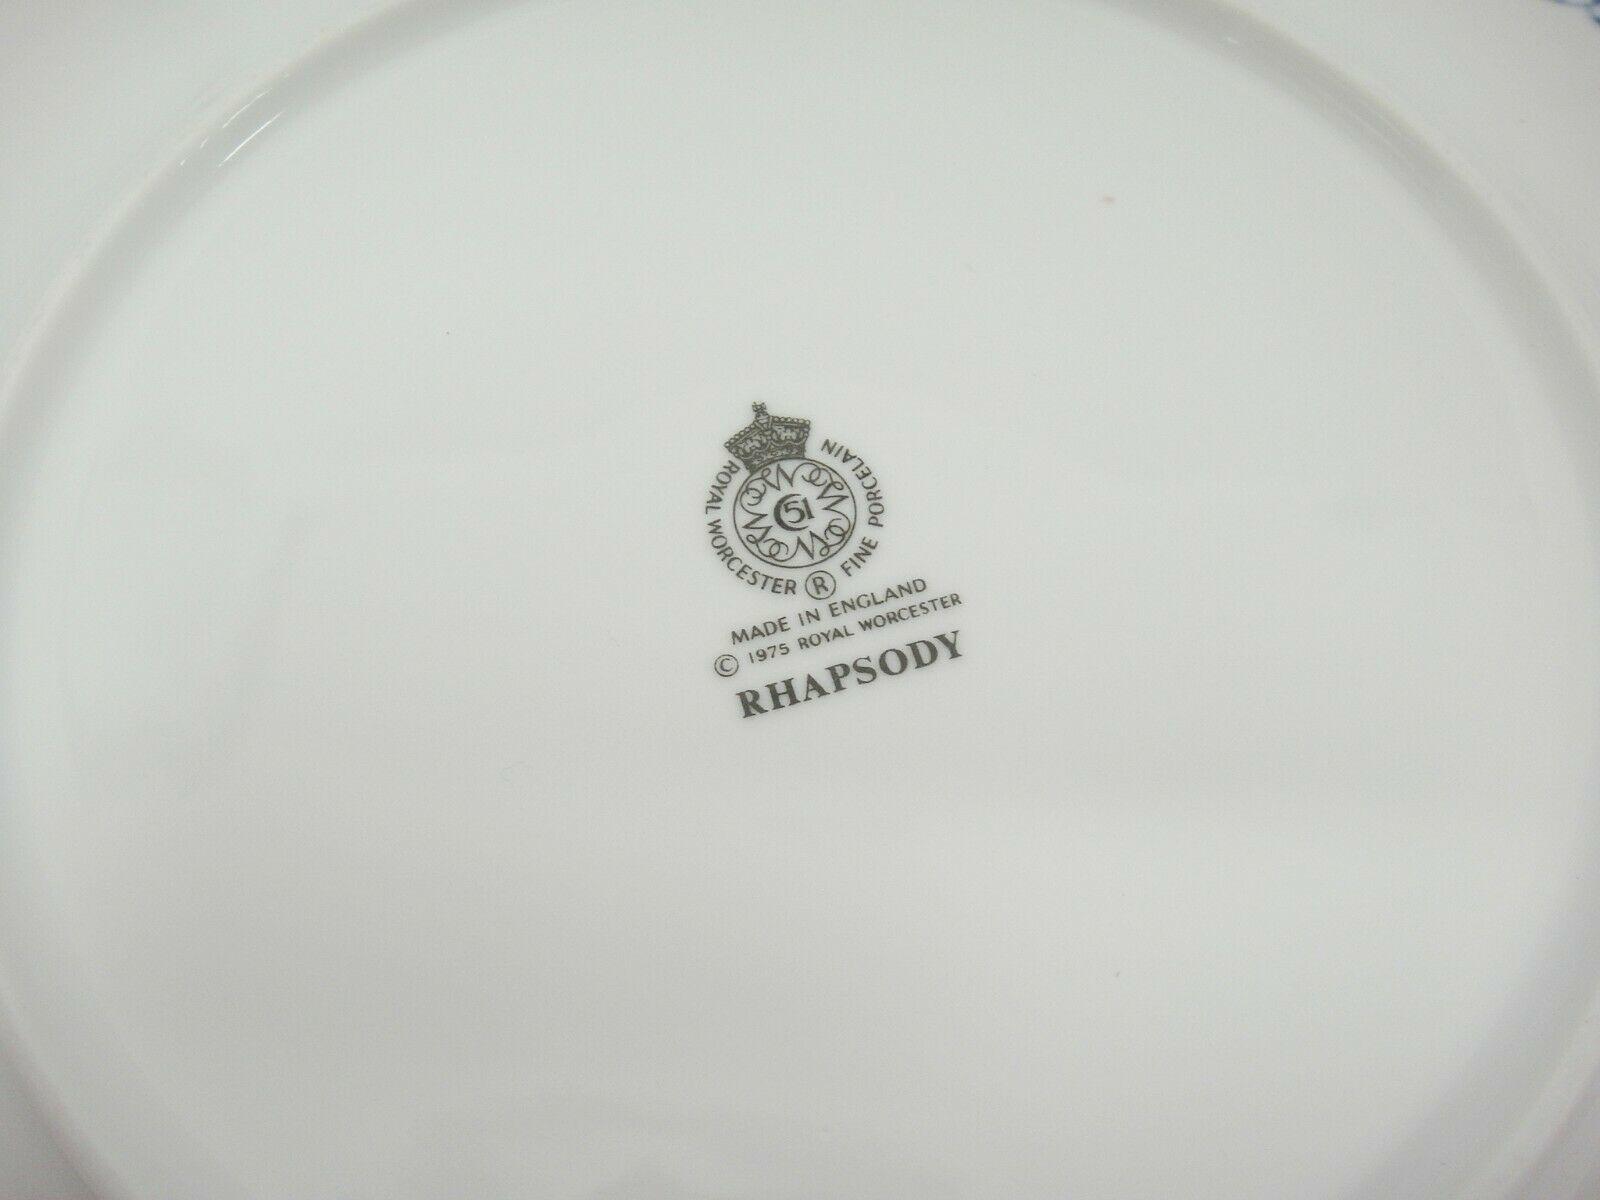 Royal Worcester Rhapsody Salad Plates Lot of 3 Blue Floral England Excellent image 3